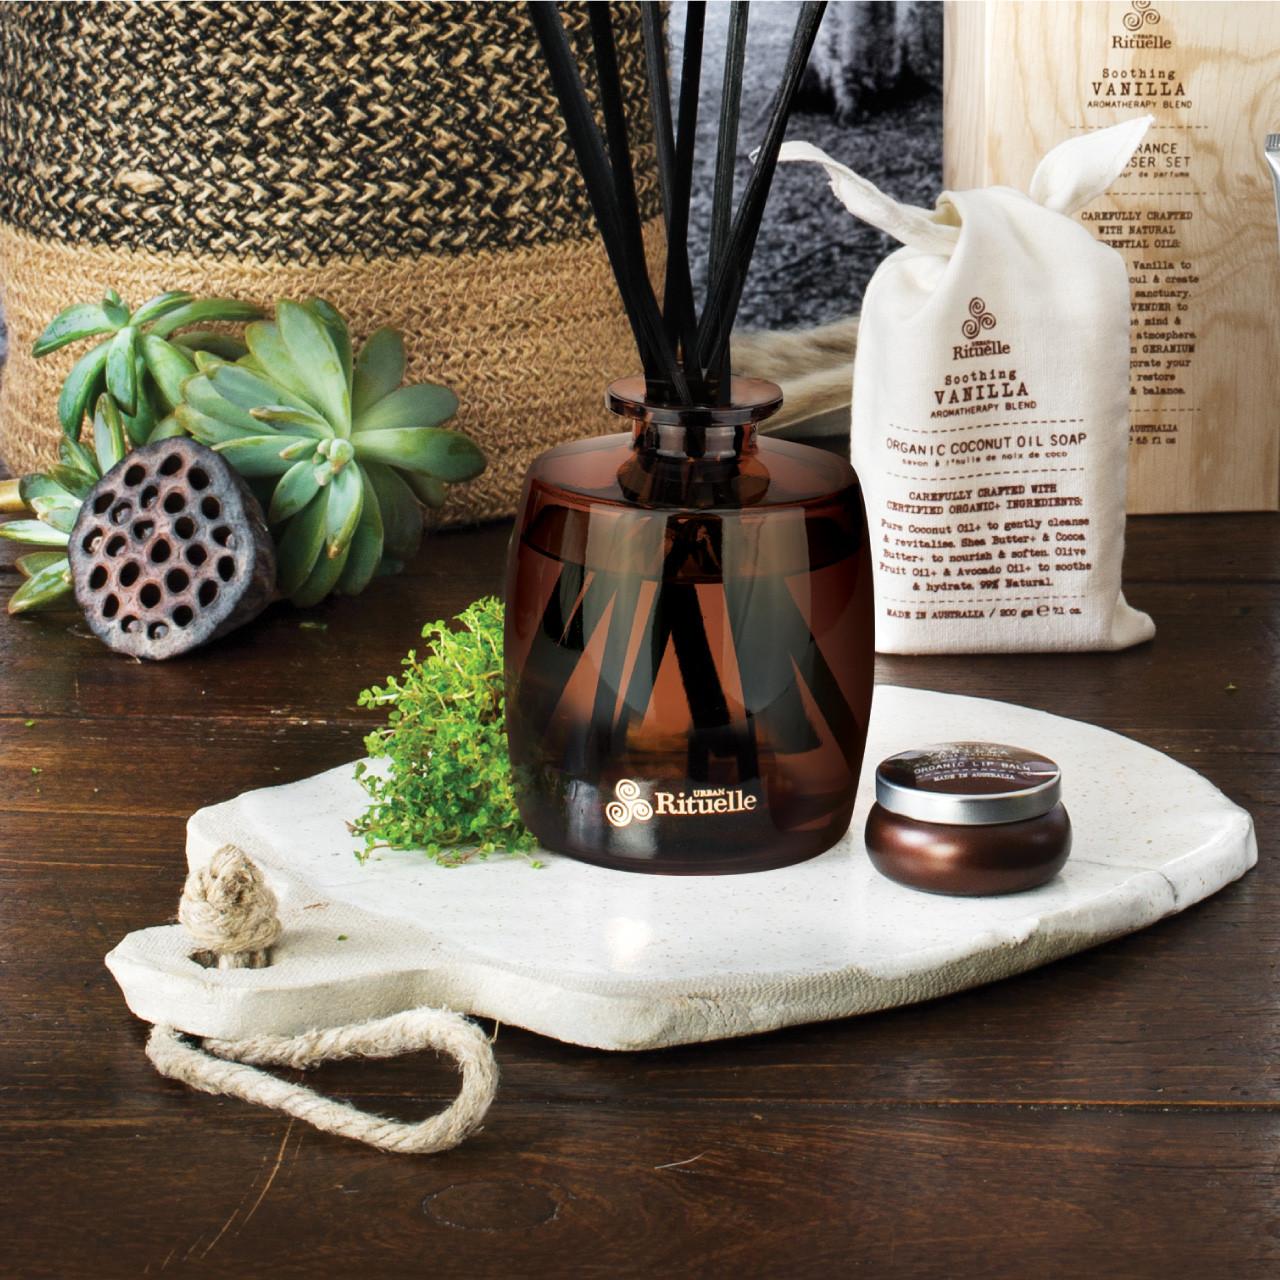 Flourish Organics - Fragrance Diffuser Set - Vanilla - Urban Rituelle